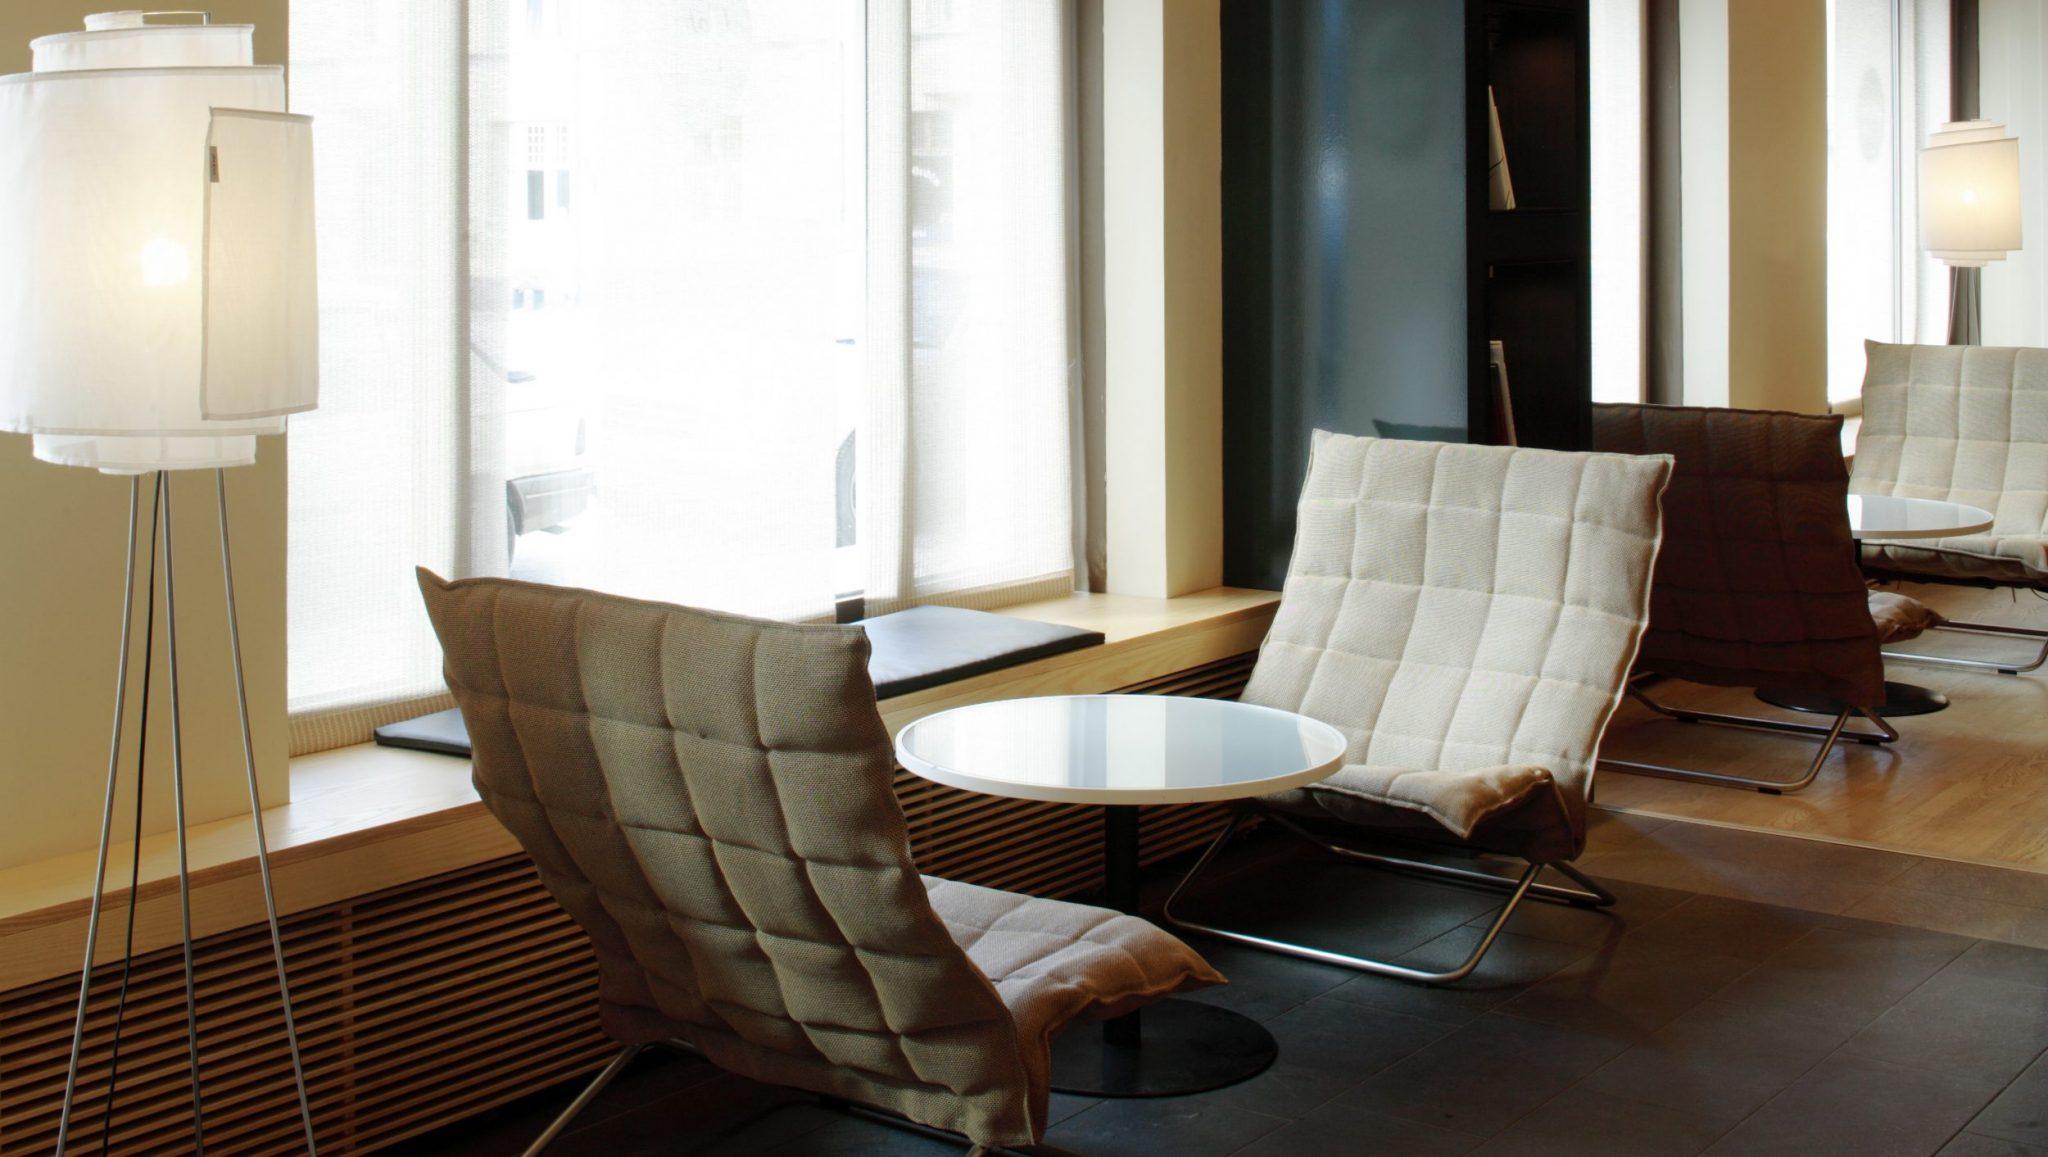 Hotel-Helka-Helsinki-GI-Project-3